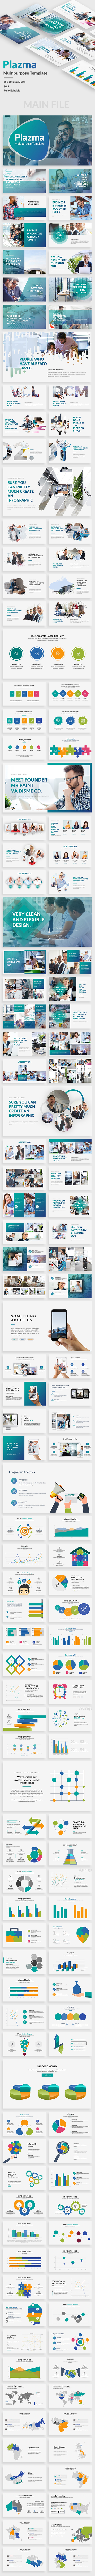 Plazma Multipurpose Premium Powerpoint Template - Business PowerPoint Templates